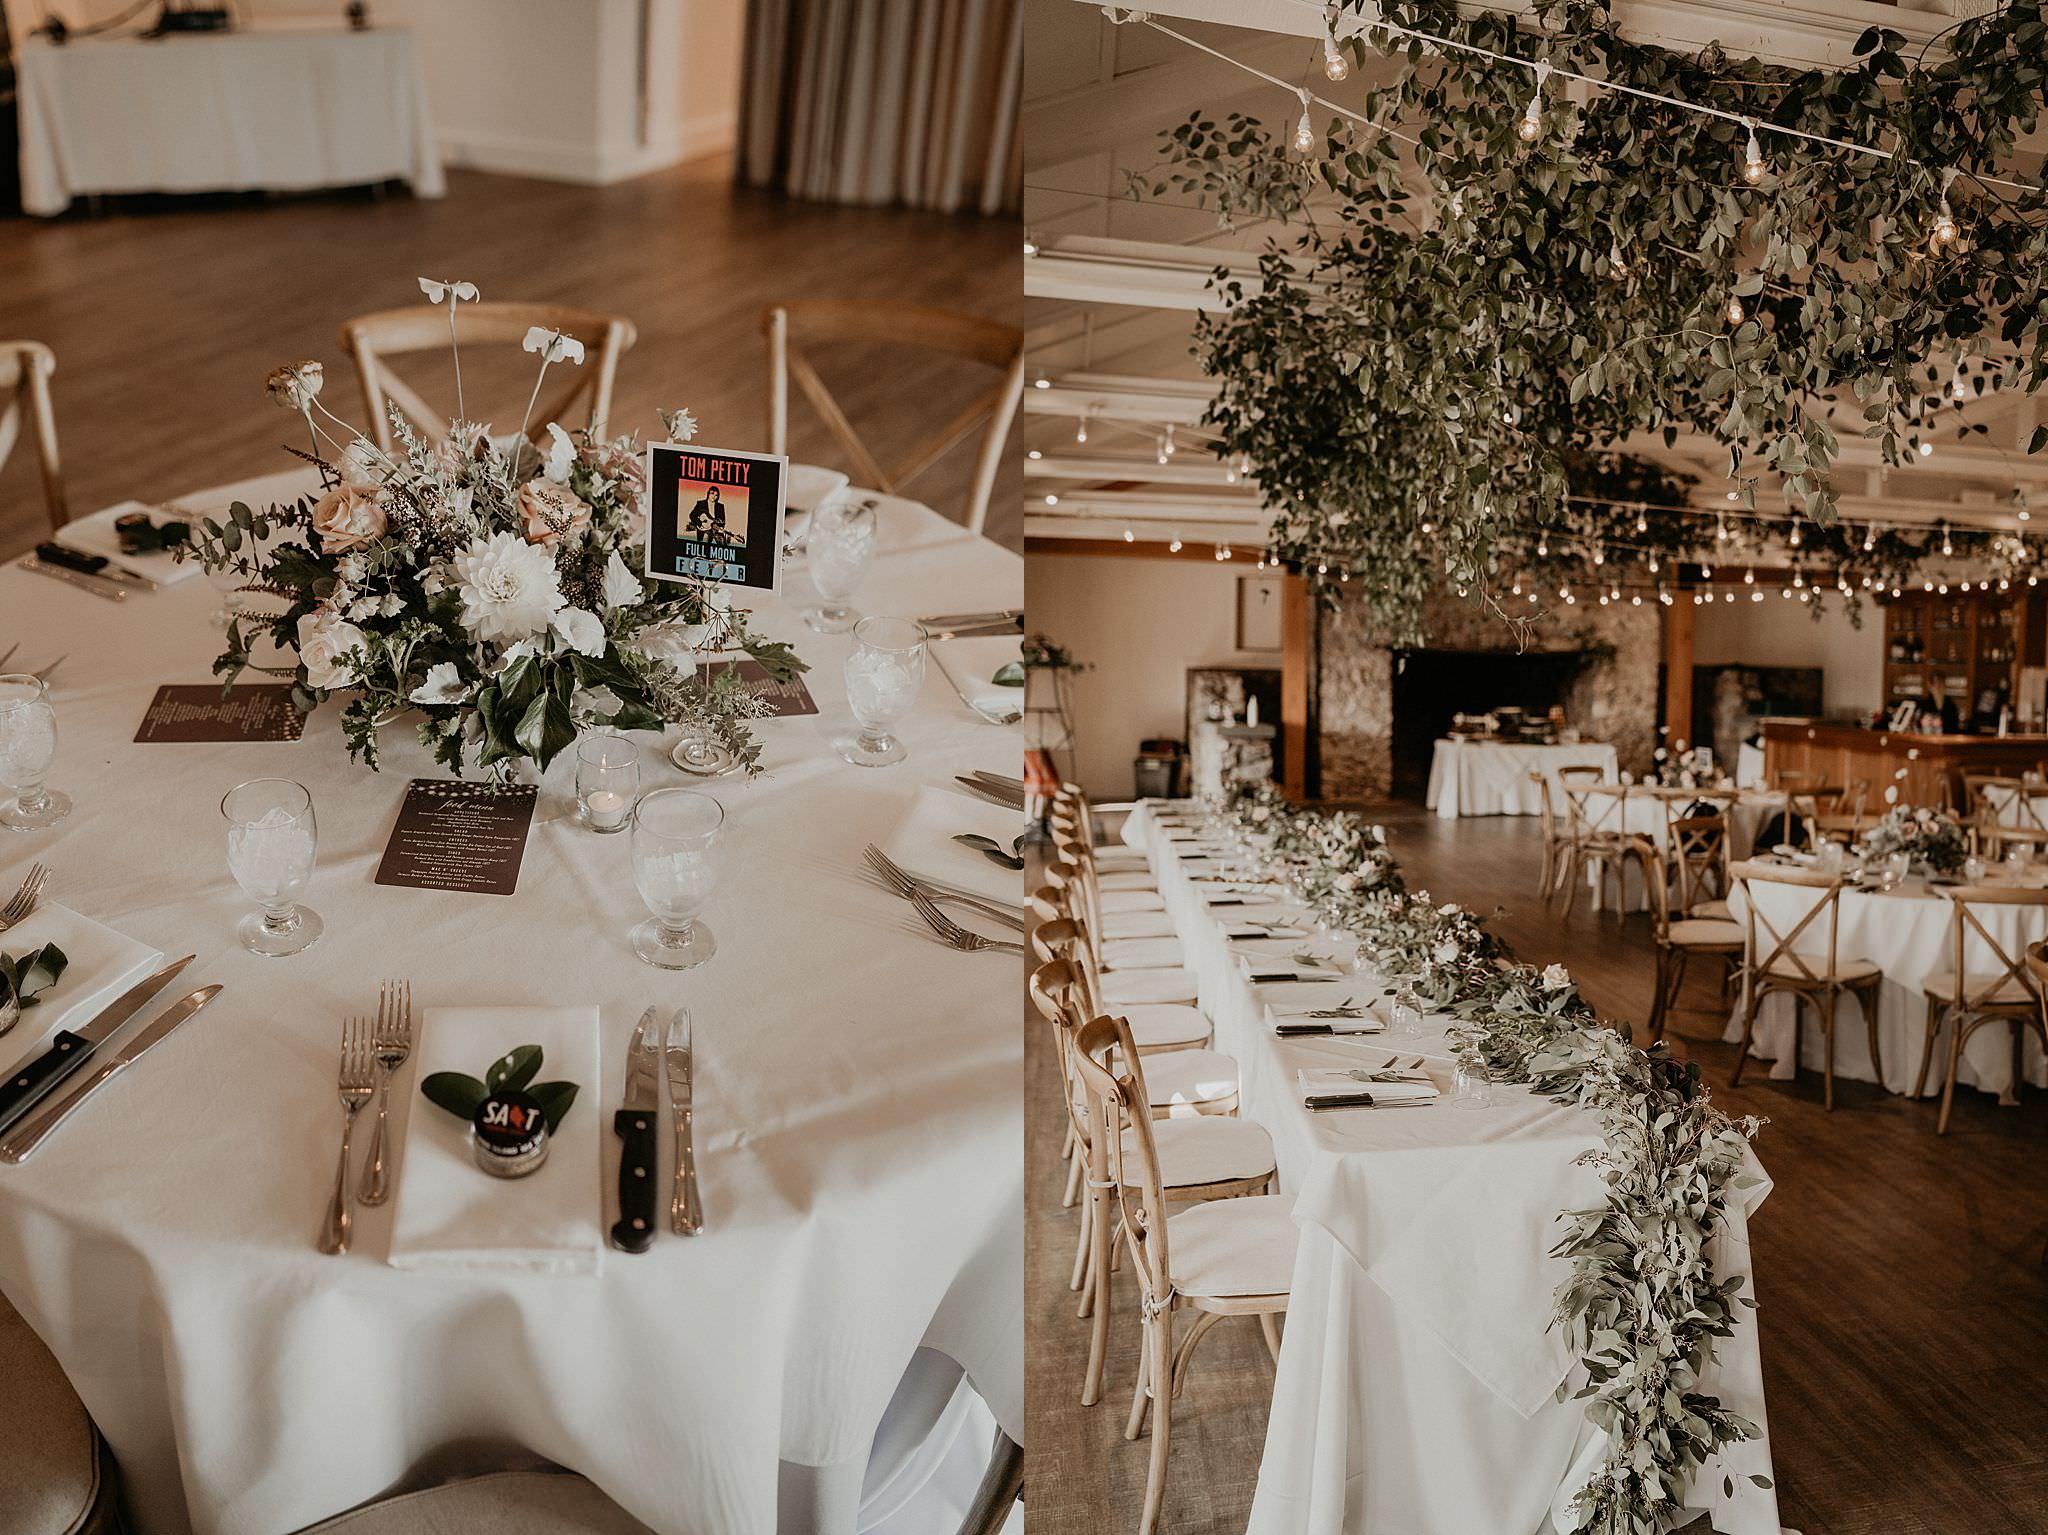 beautiful and elegant eucalyptus blush flowers wedding details and decorations Roche Harbor resort